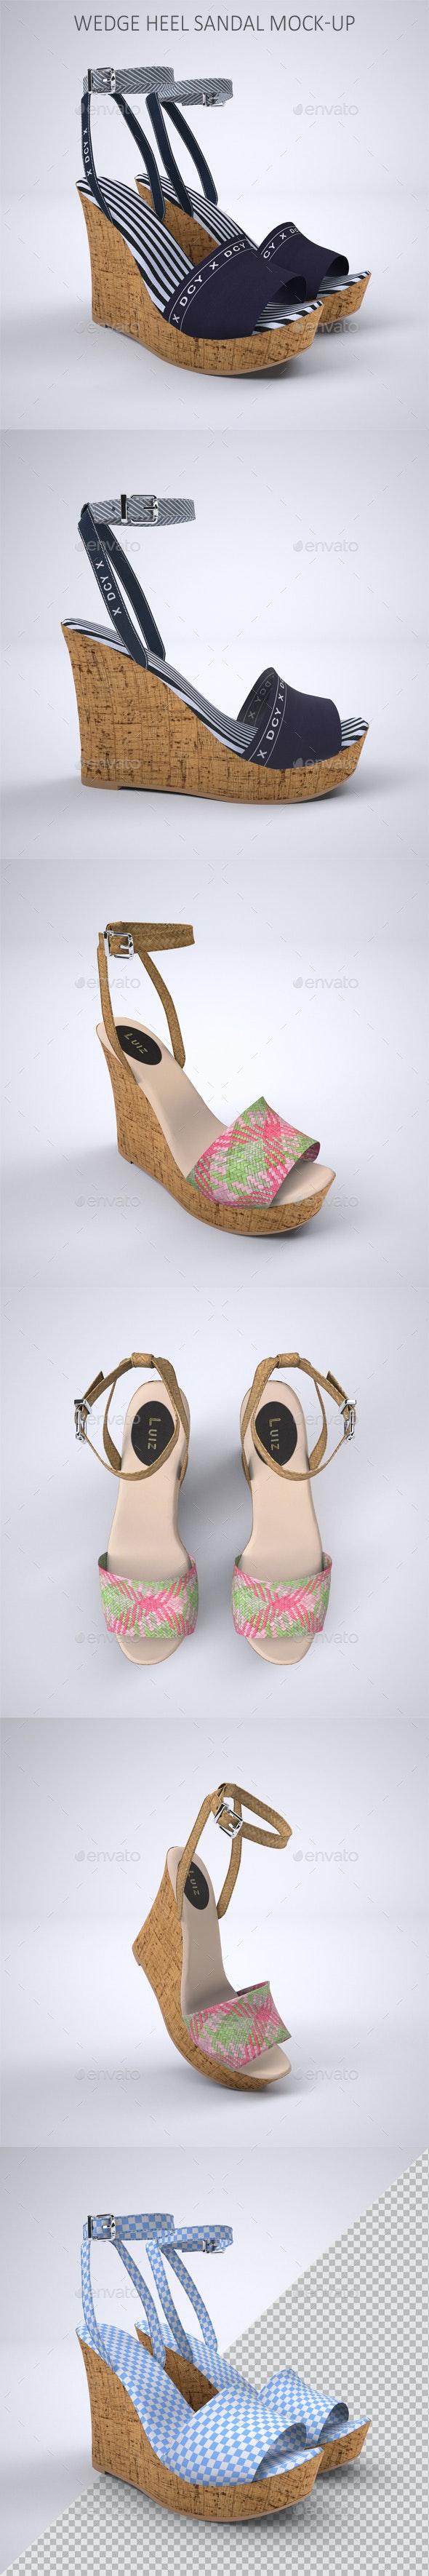 Wedge Heel Sandals Mock-up - Product Mock-Ups Graphics